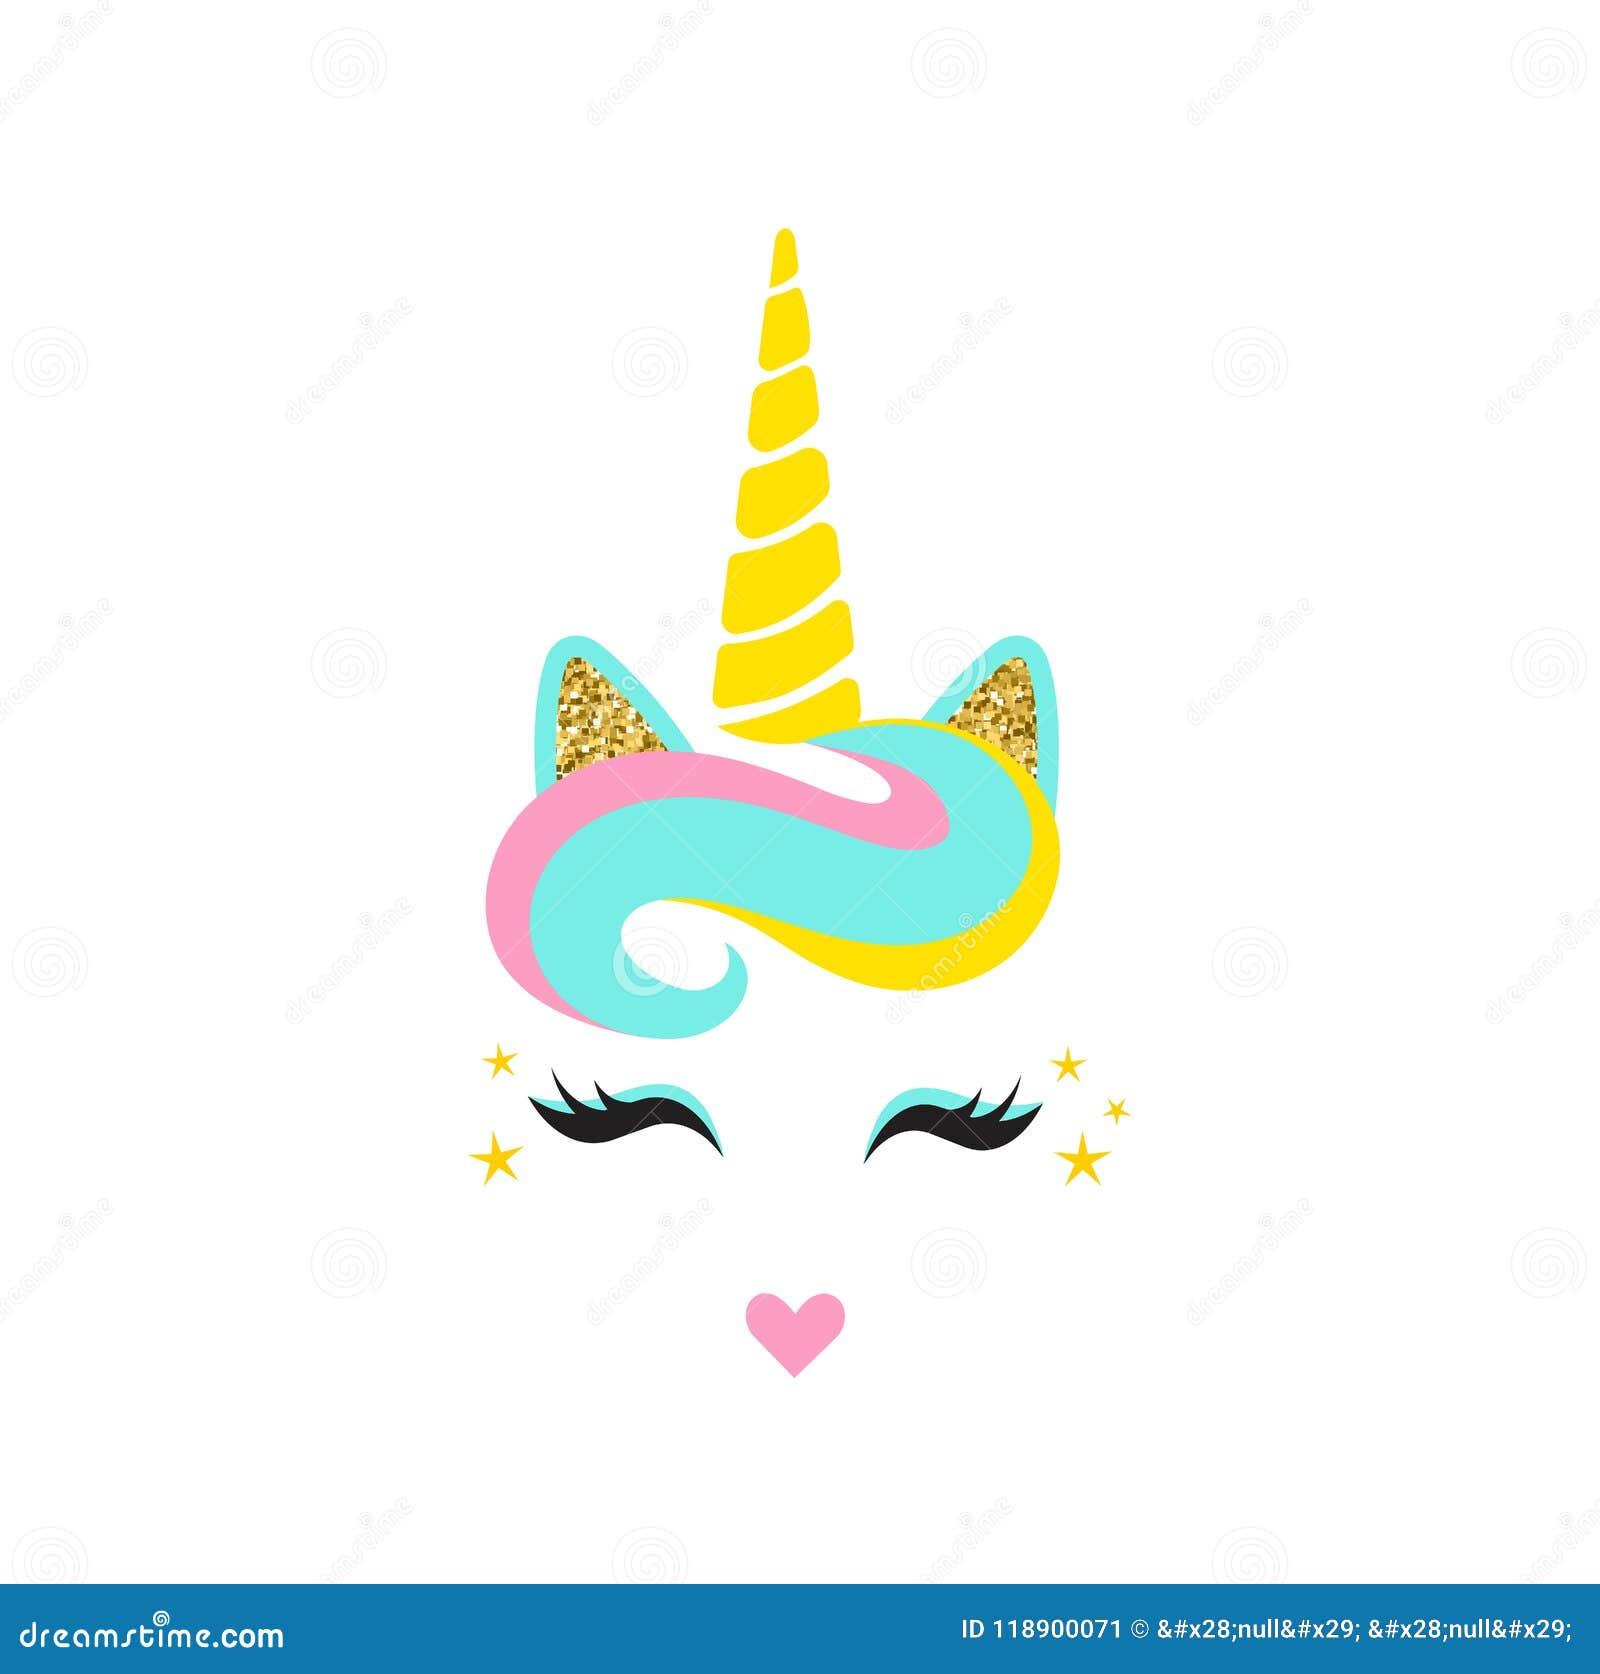 Unicorn Horn /& Ears Rose Gold Glitter with eyelashes